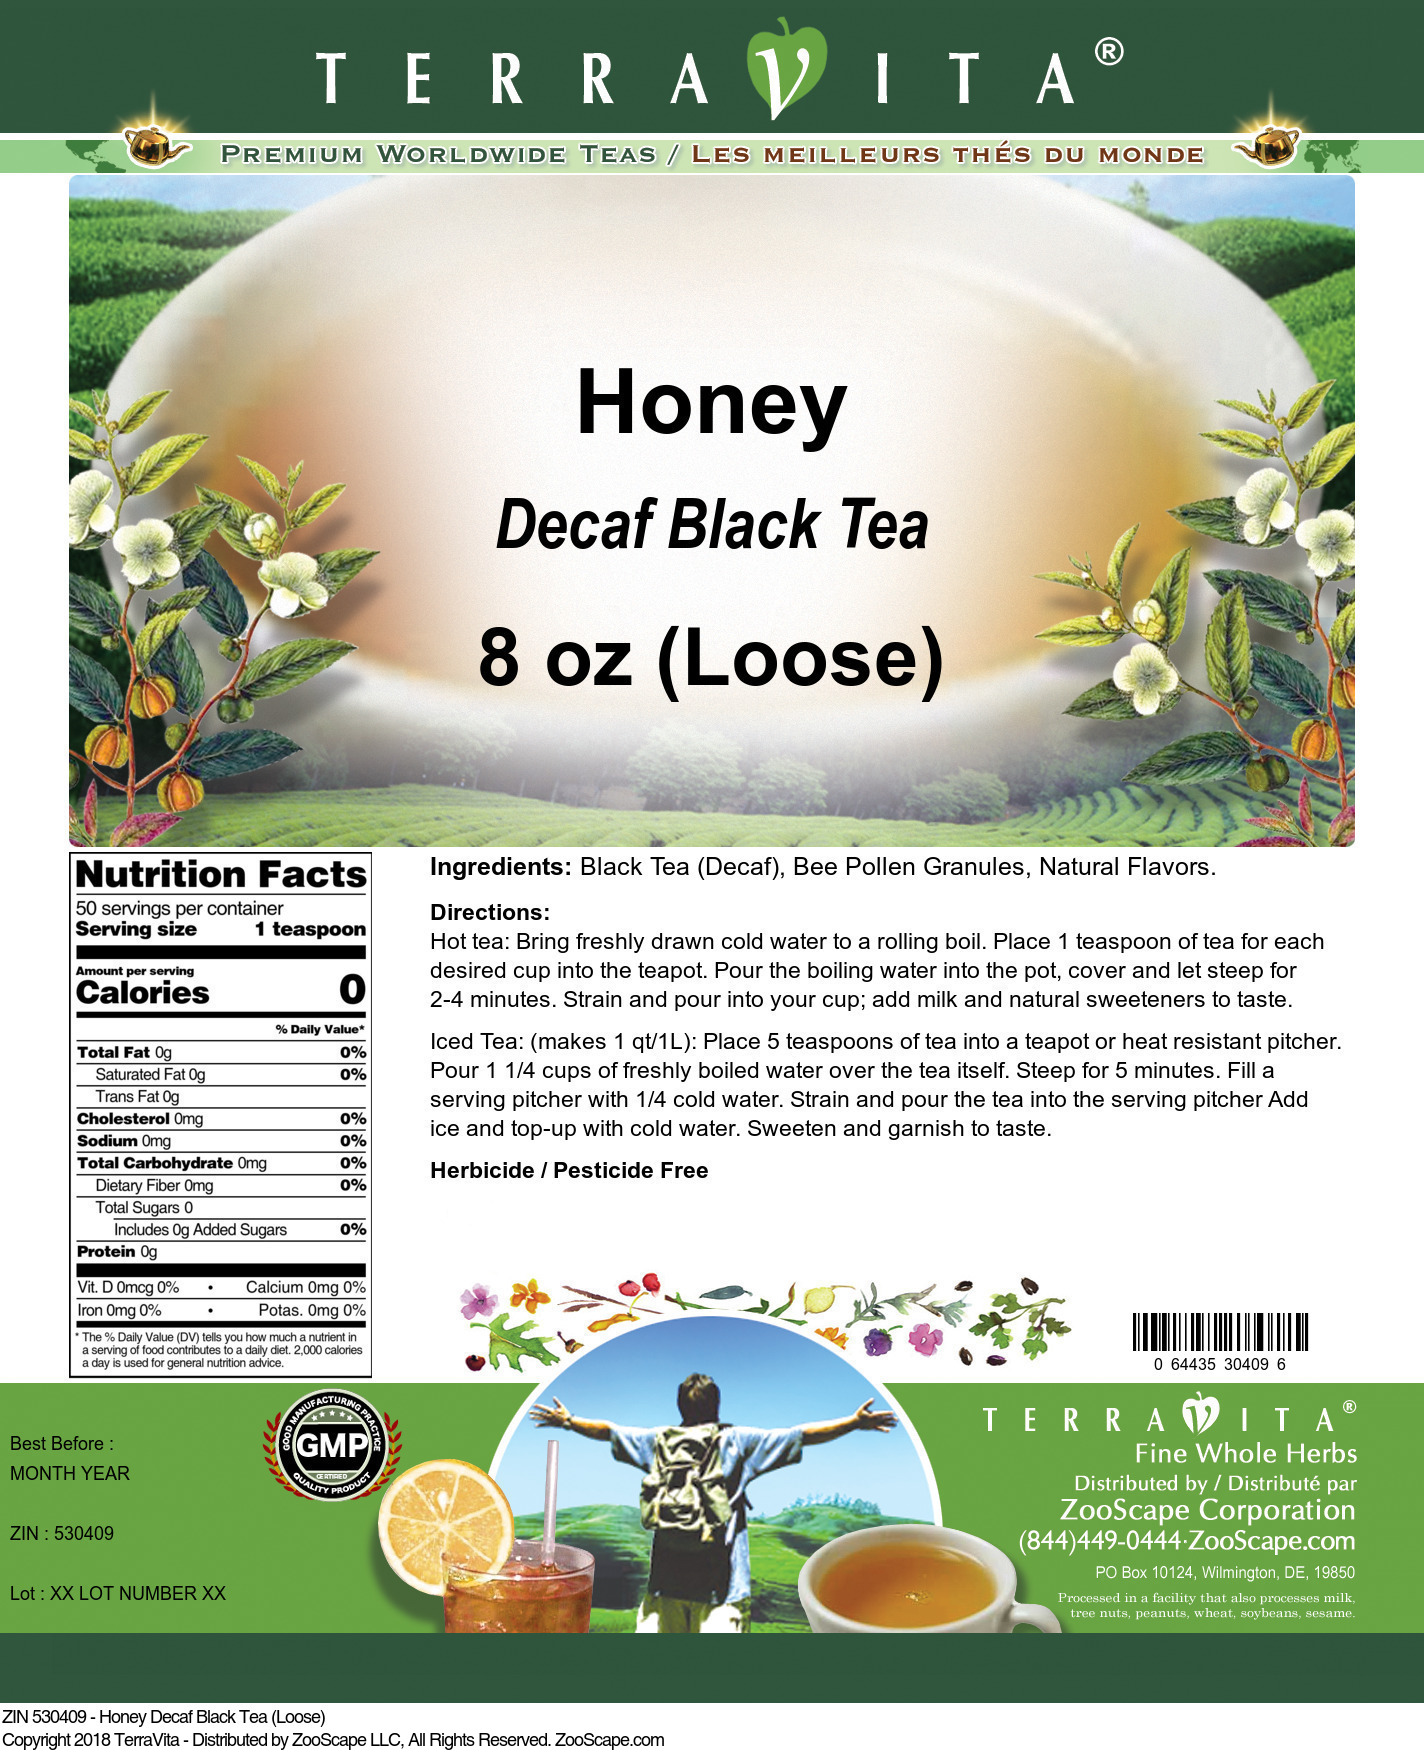 Honey Decaf Black Tea (Loose)